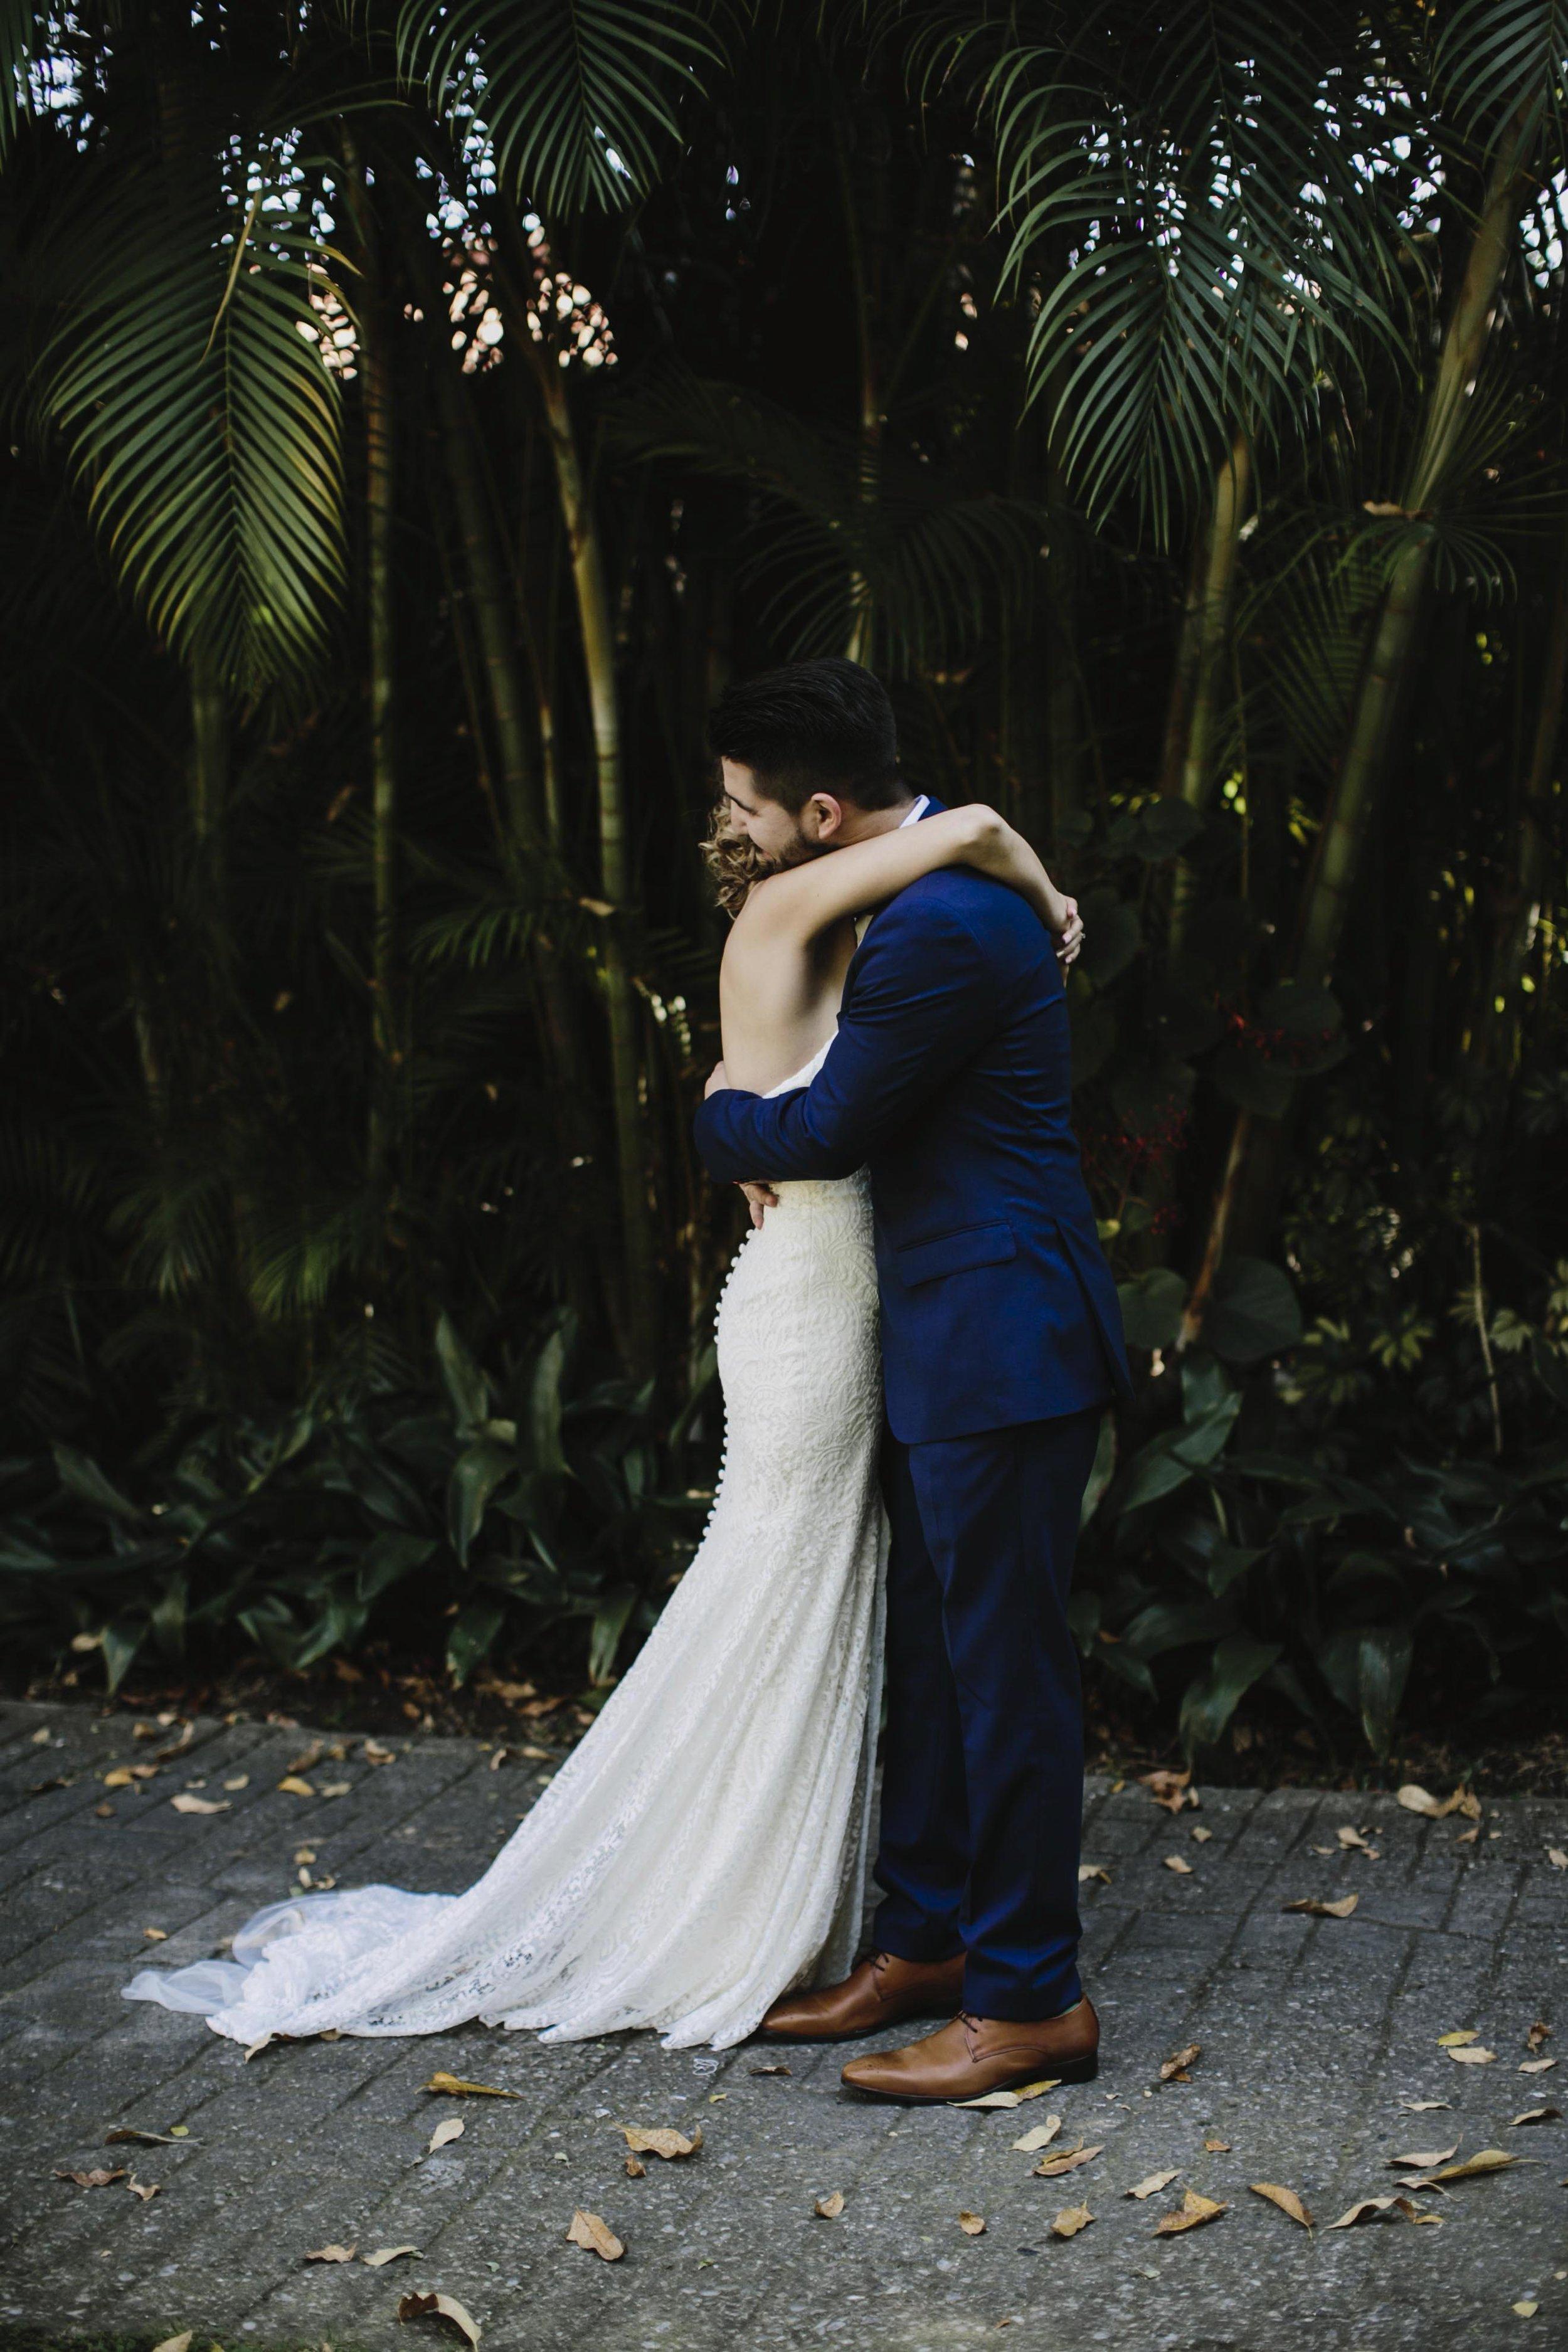 alfonso_flores_destination_wedding_photography_jardin_amarello_cuernavaca70.jpg